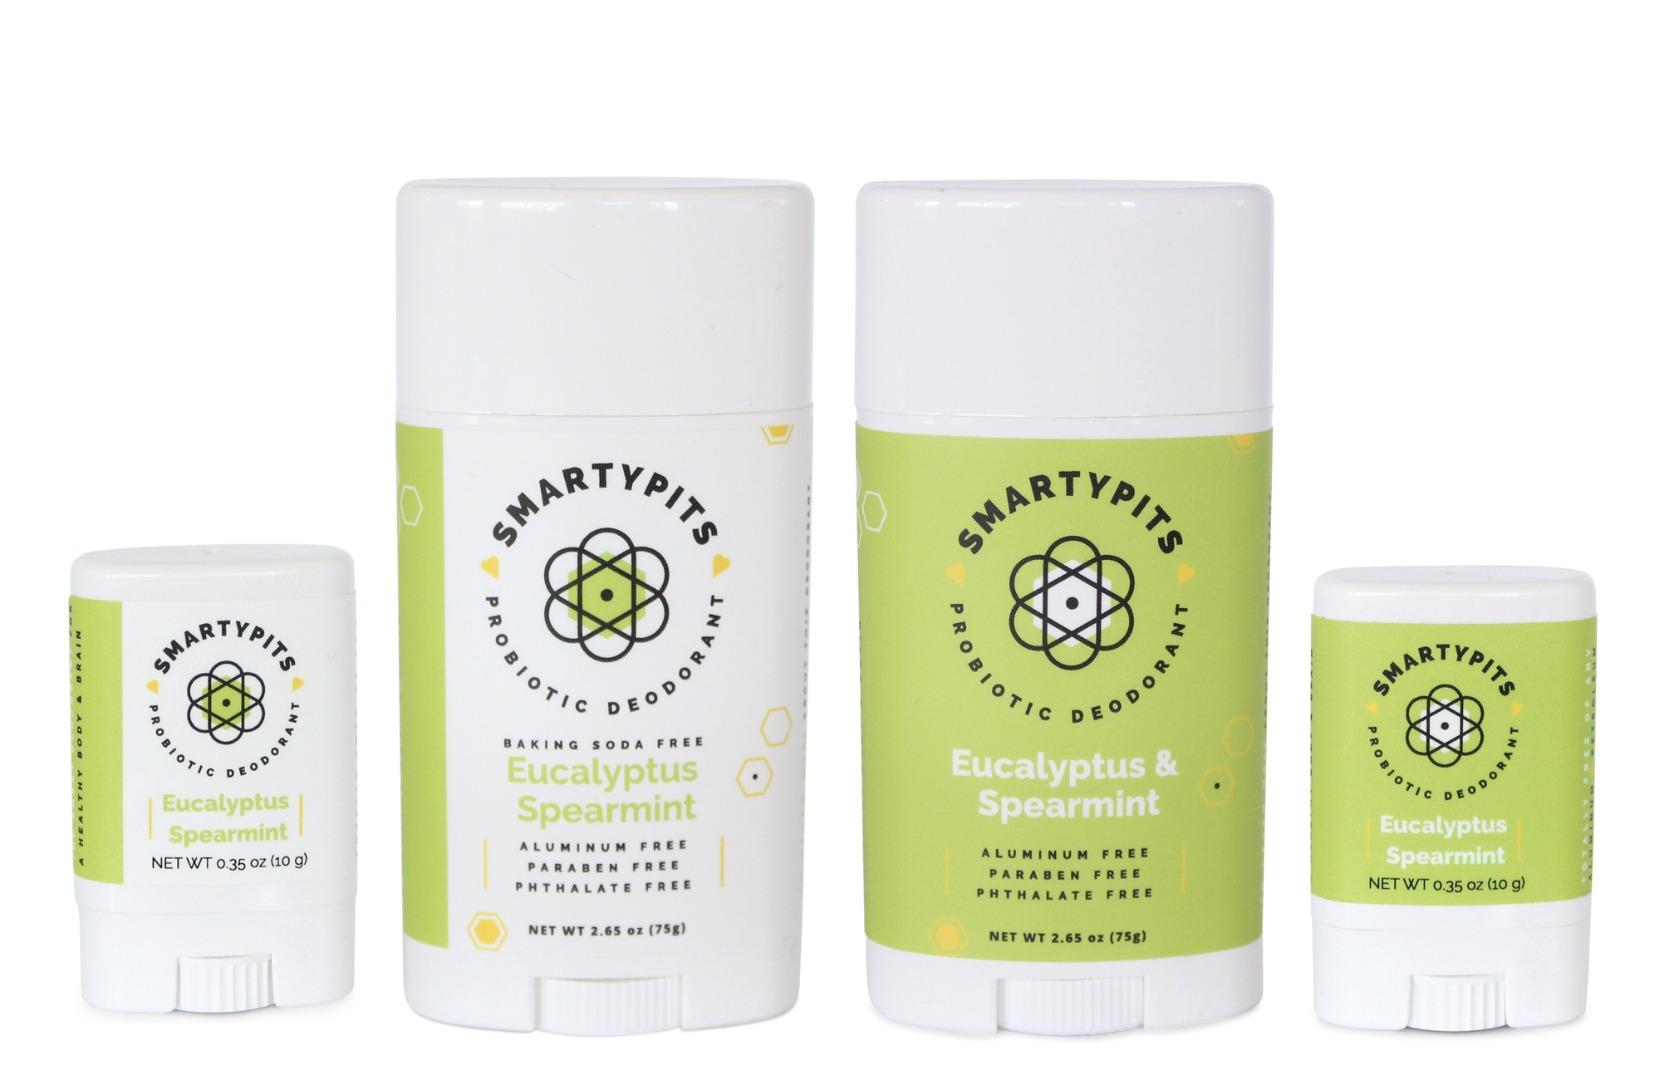 Natural Probiotic Deodorant